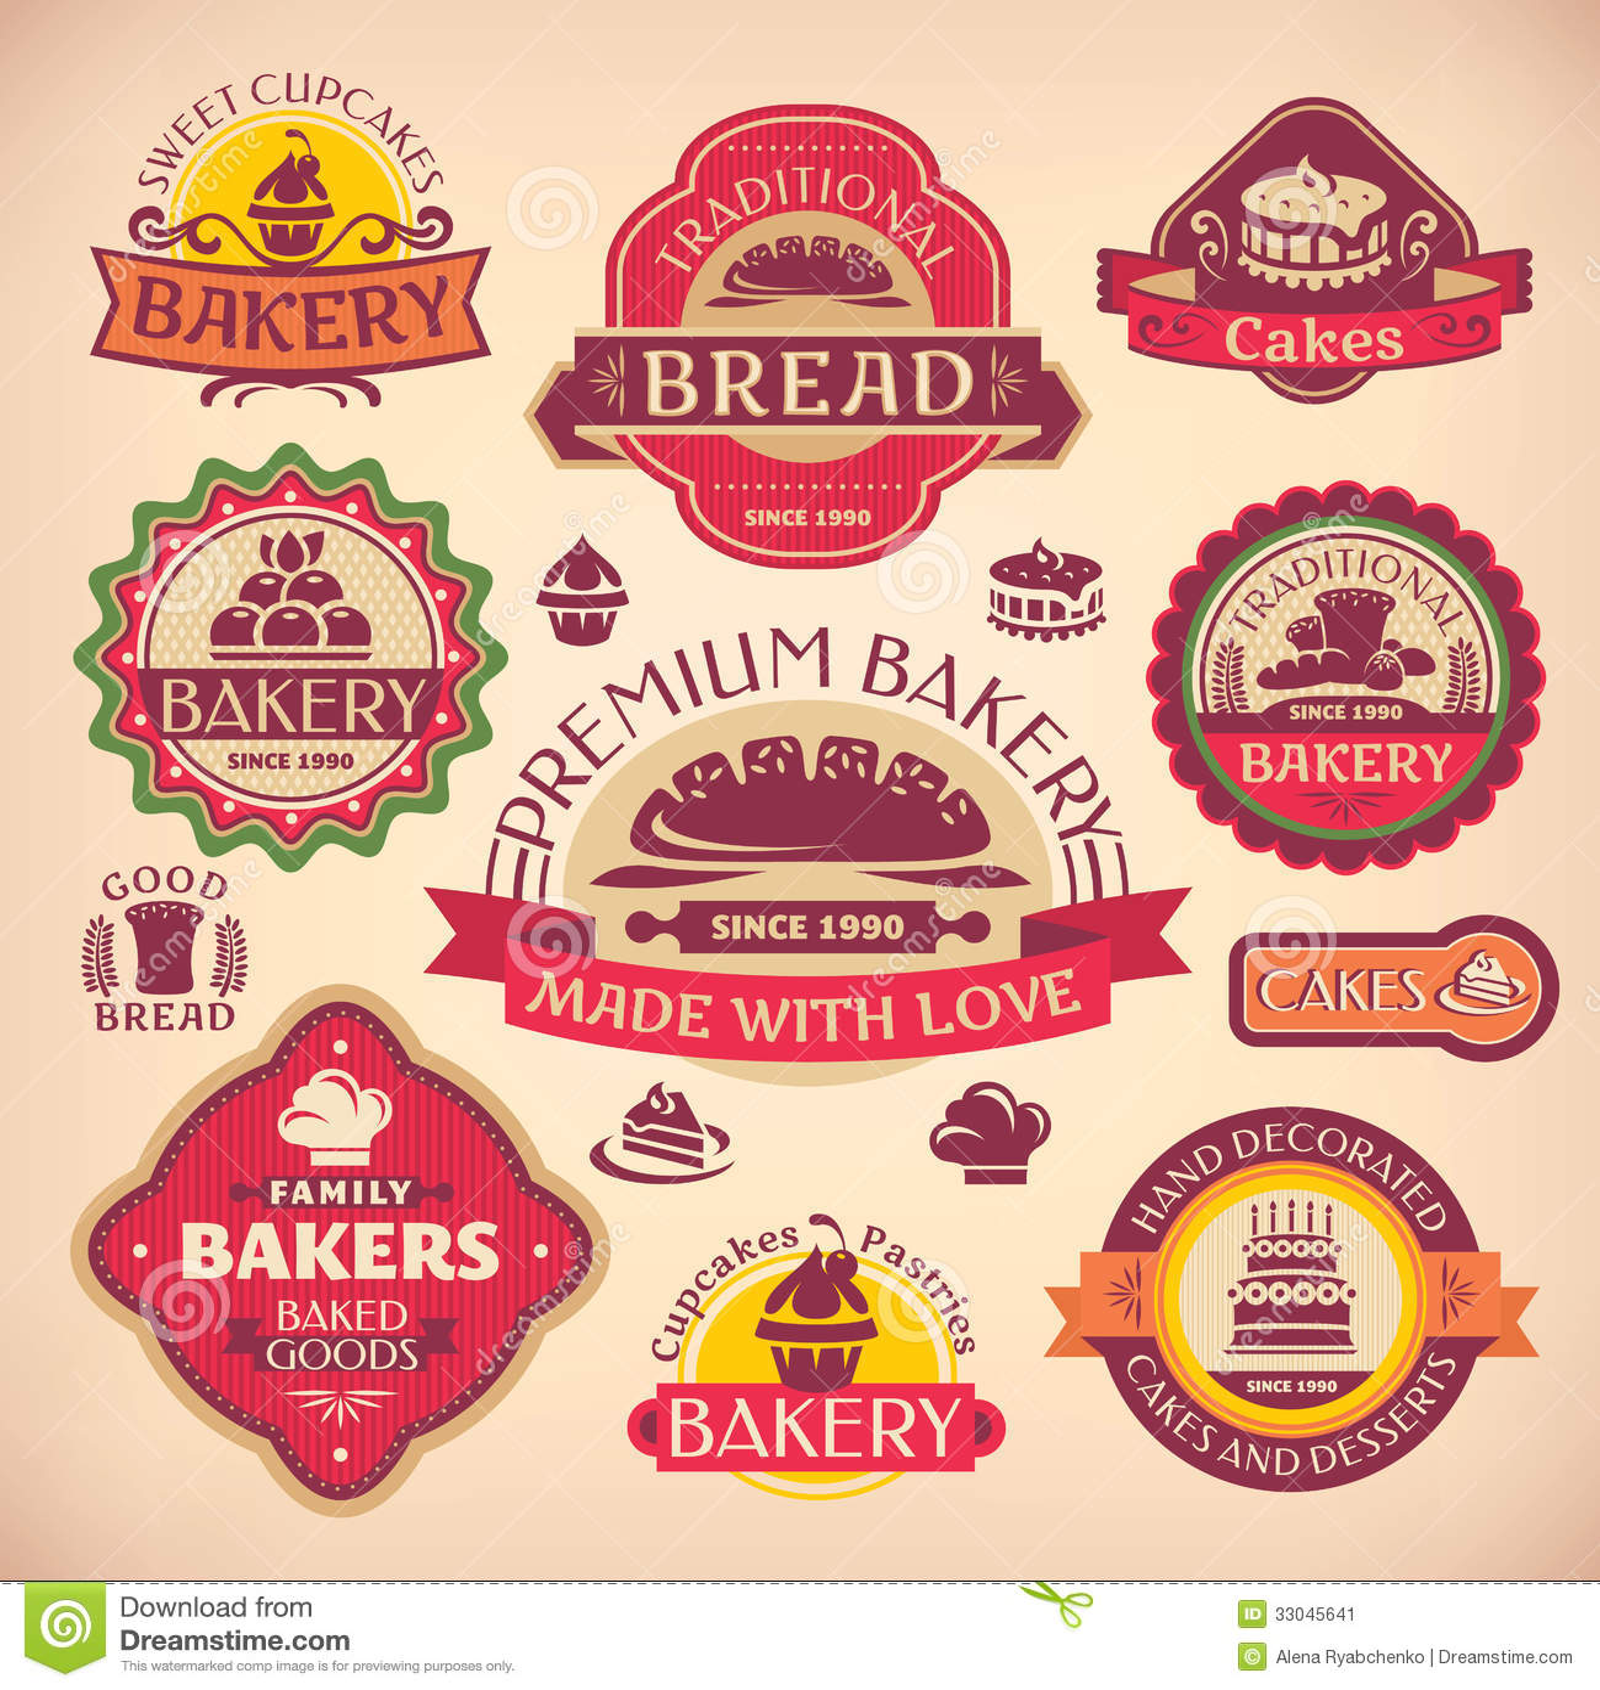 Set Of Vintage Bakery Labels Stock Image - Image: 33045641